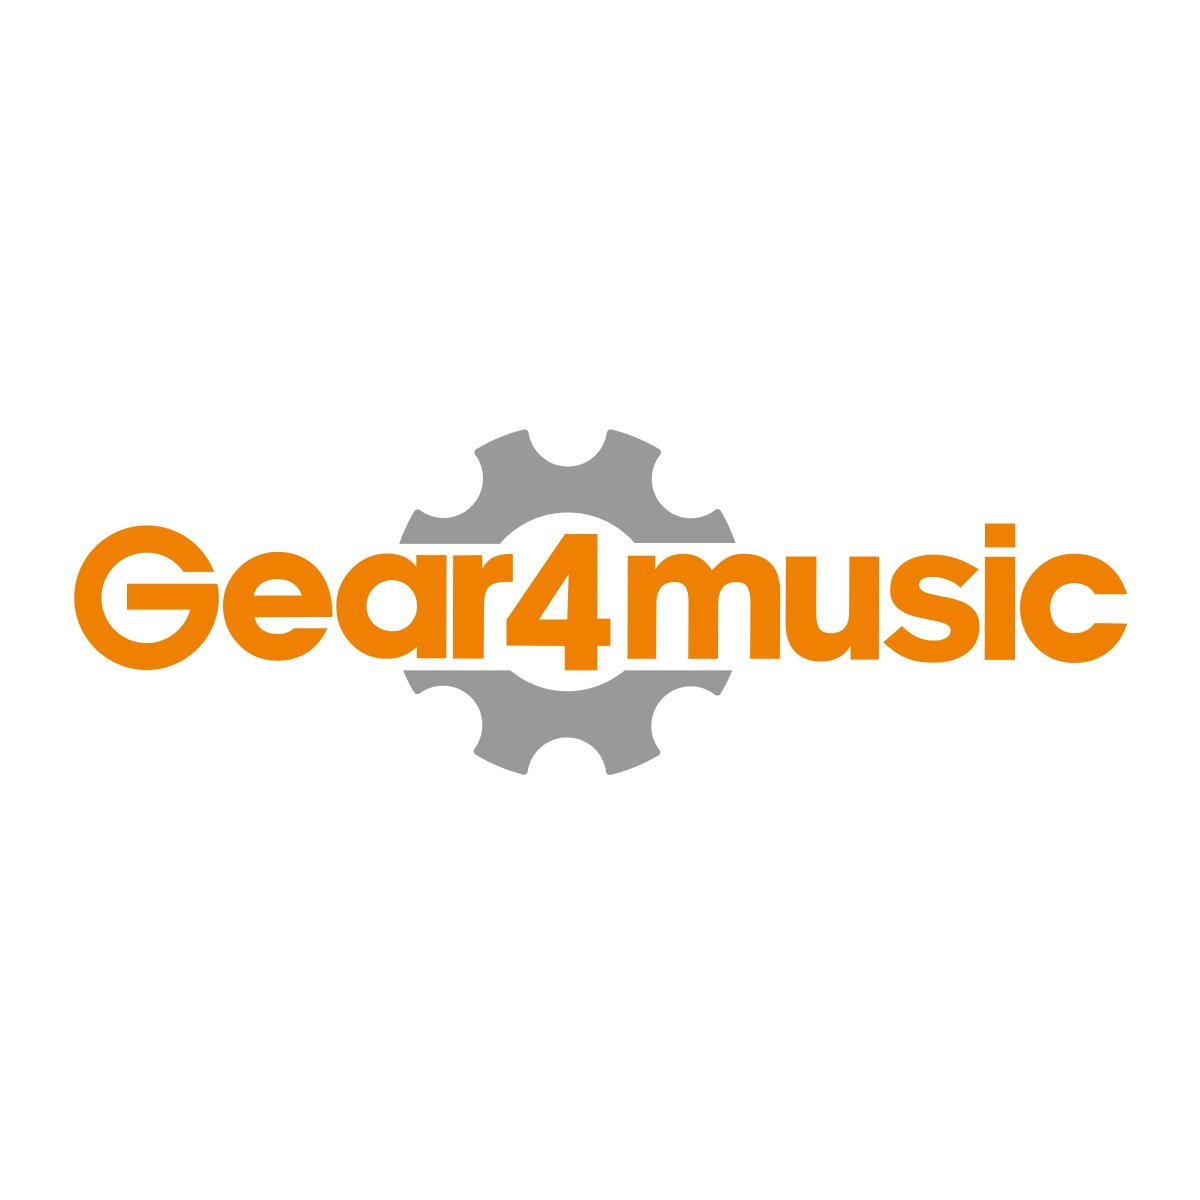 3 Piece Microphone Set by Gear4music